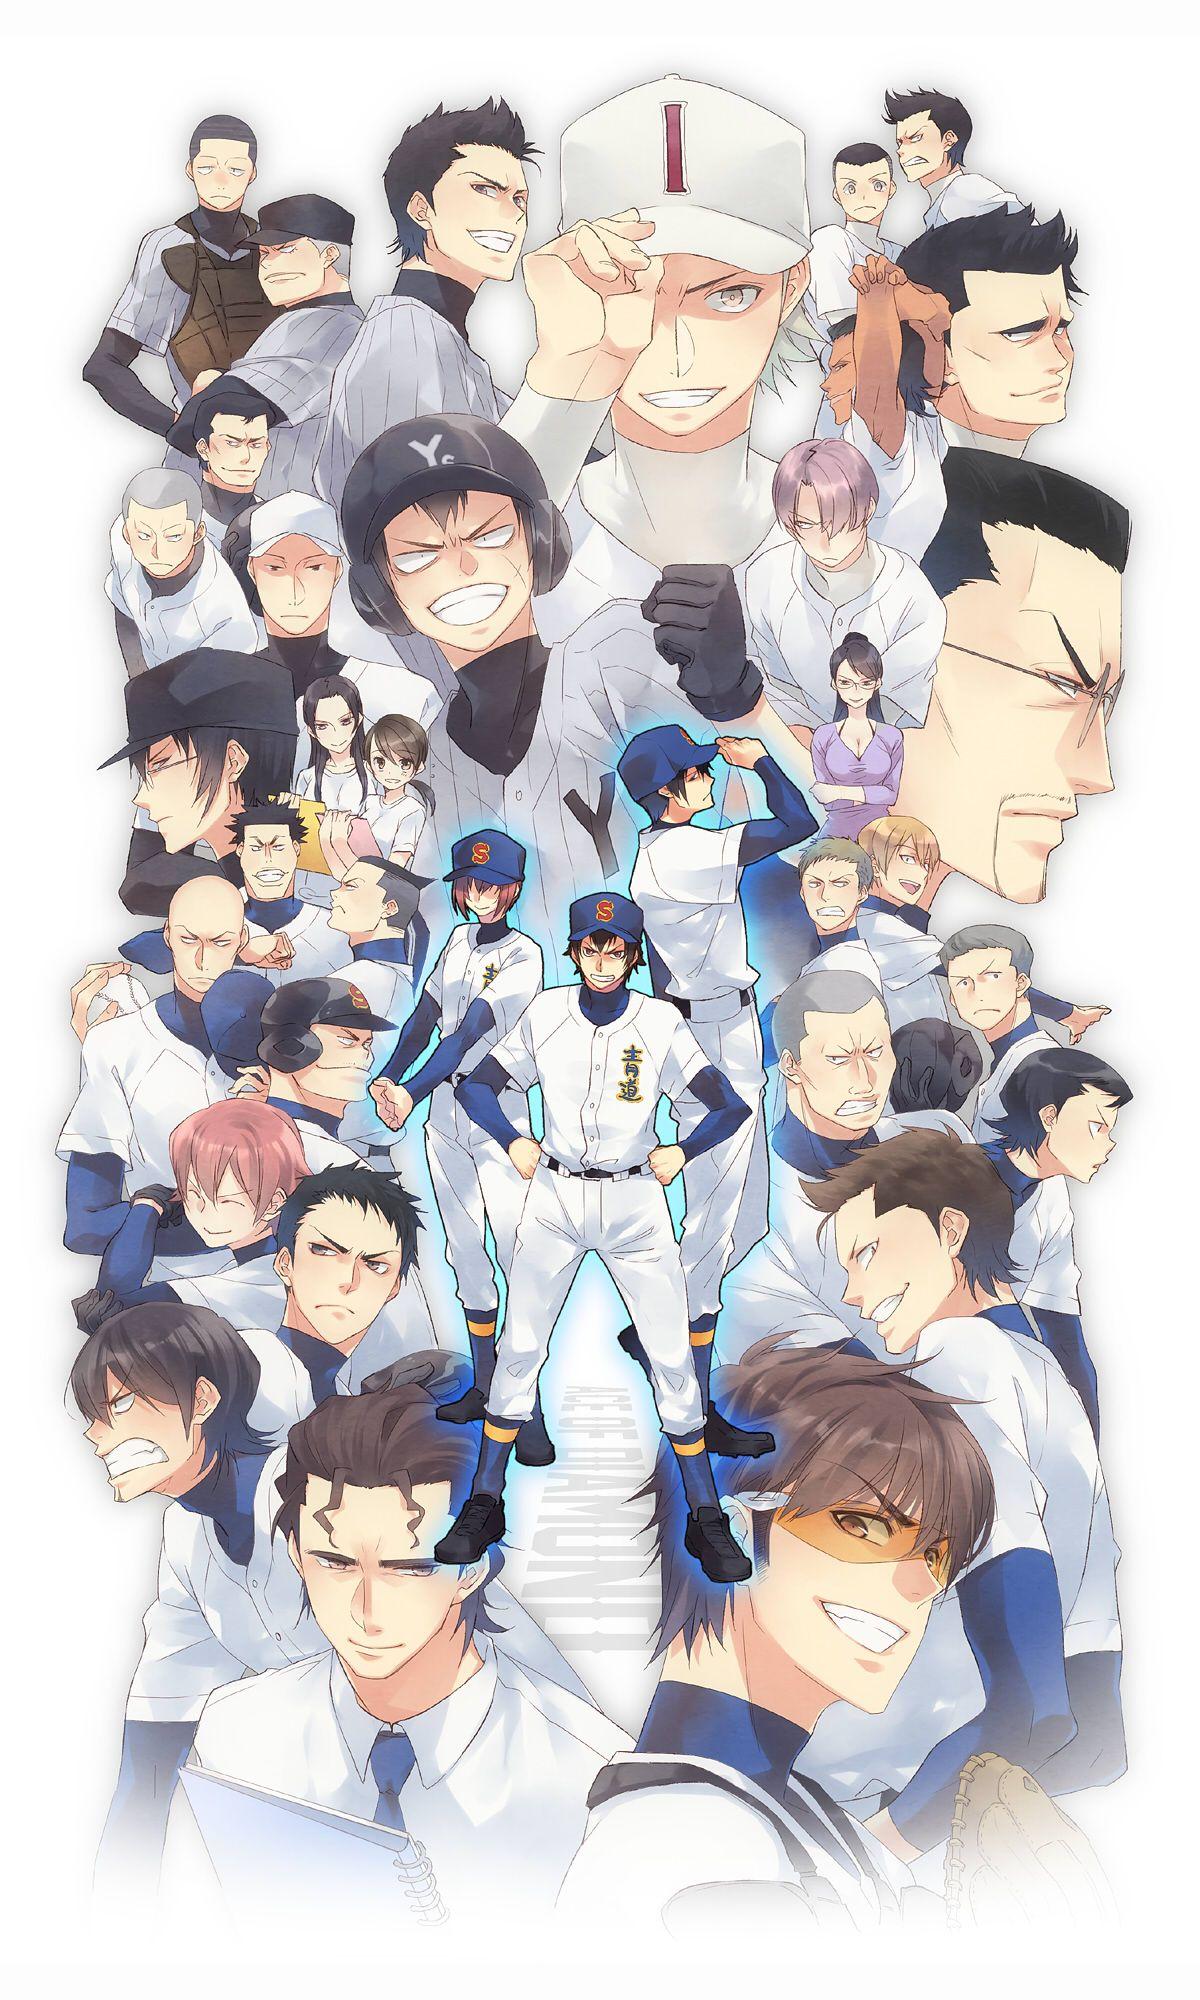 Diamond No Ace Full 1626119 Jpg 1200 2000 Anime Ace Of Diamonds Ace